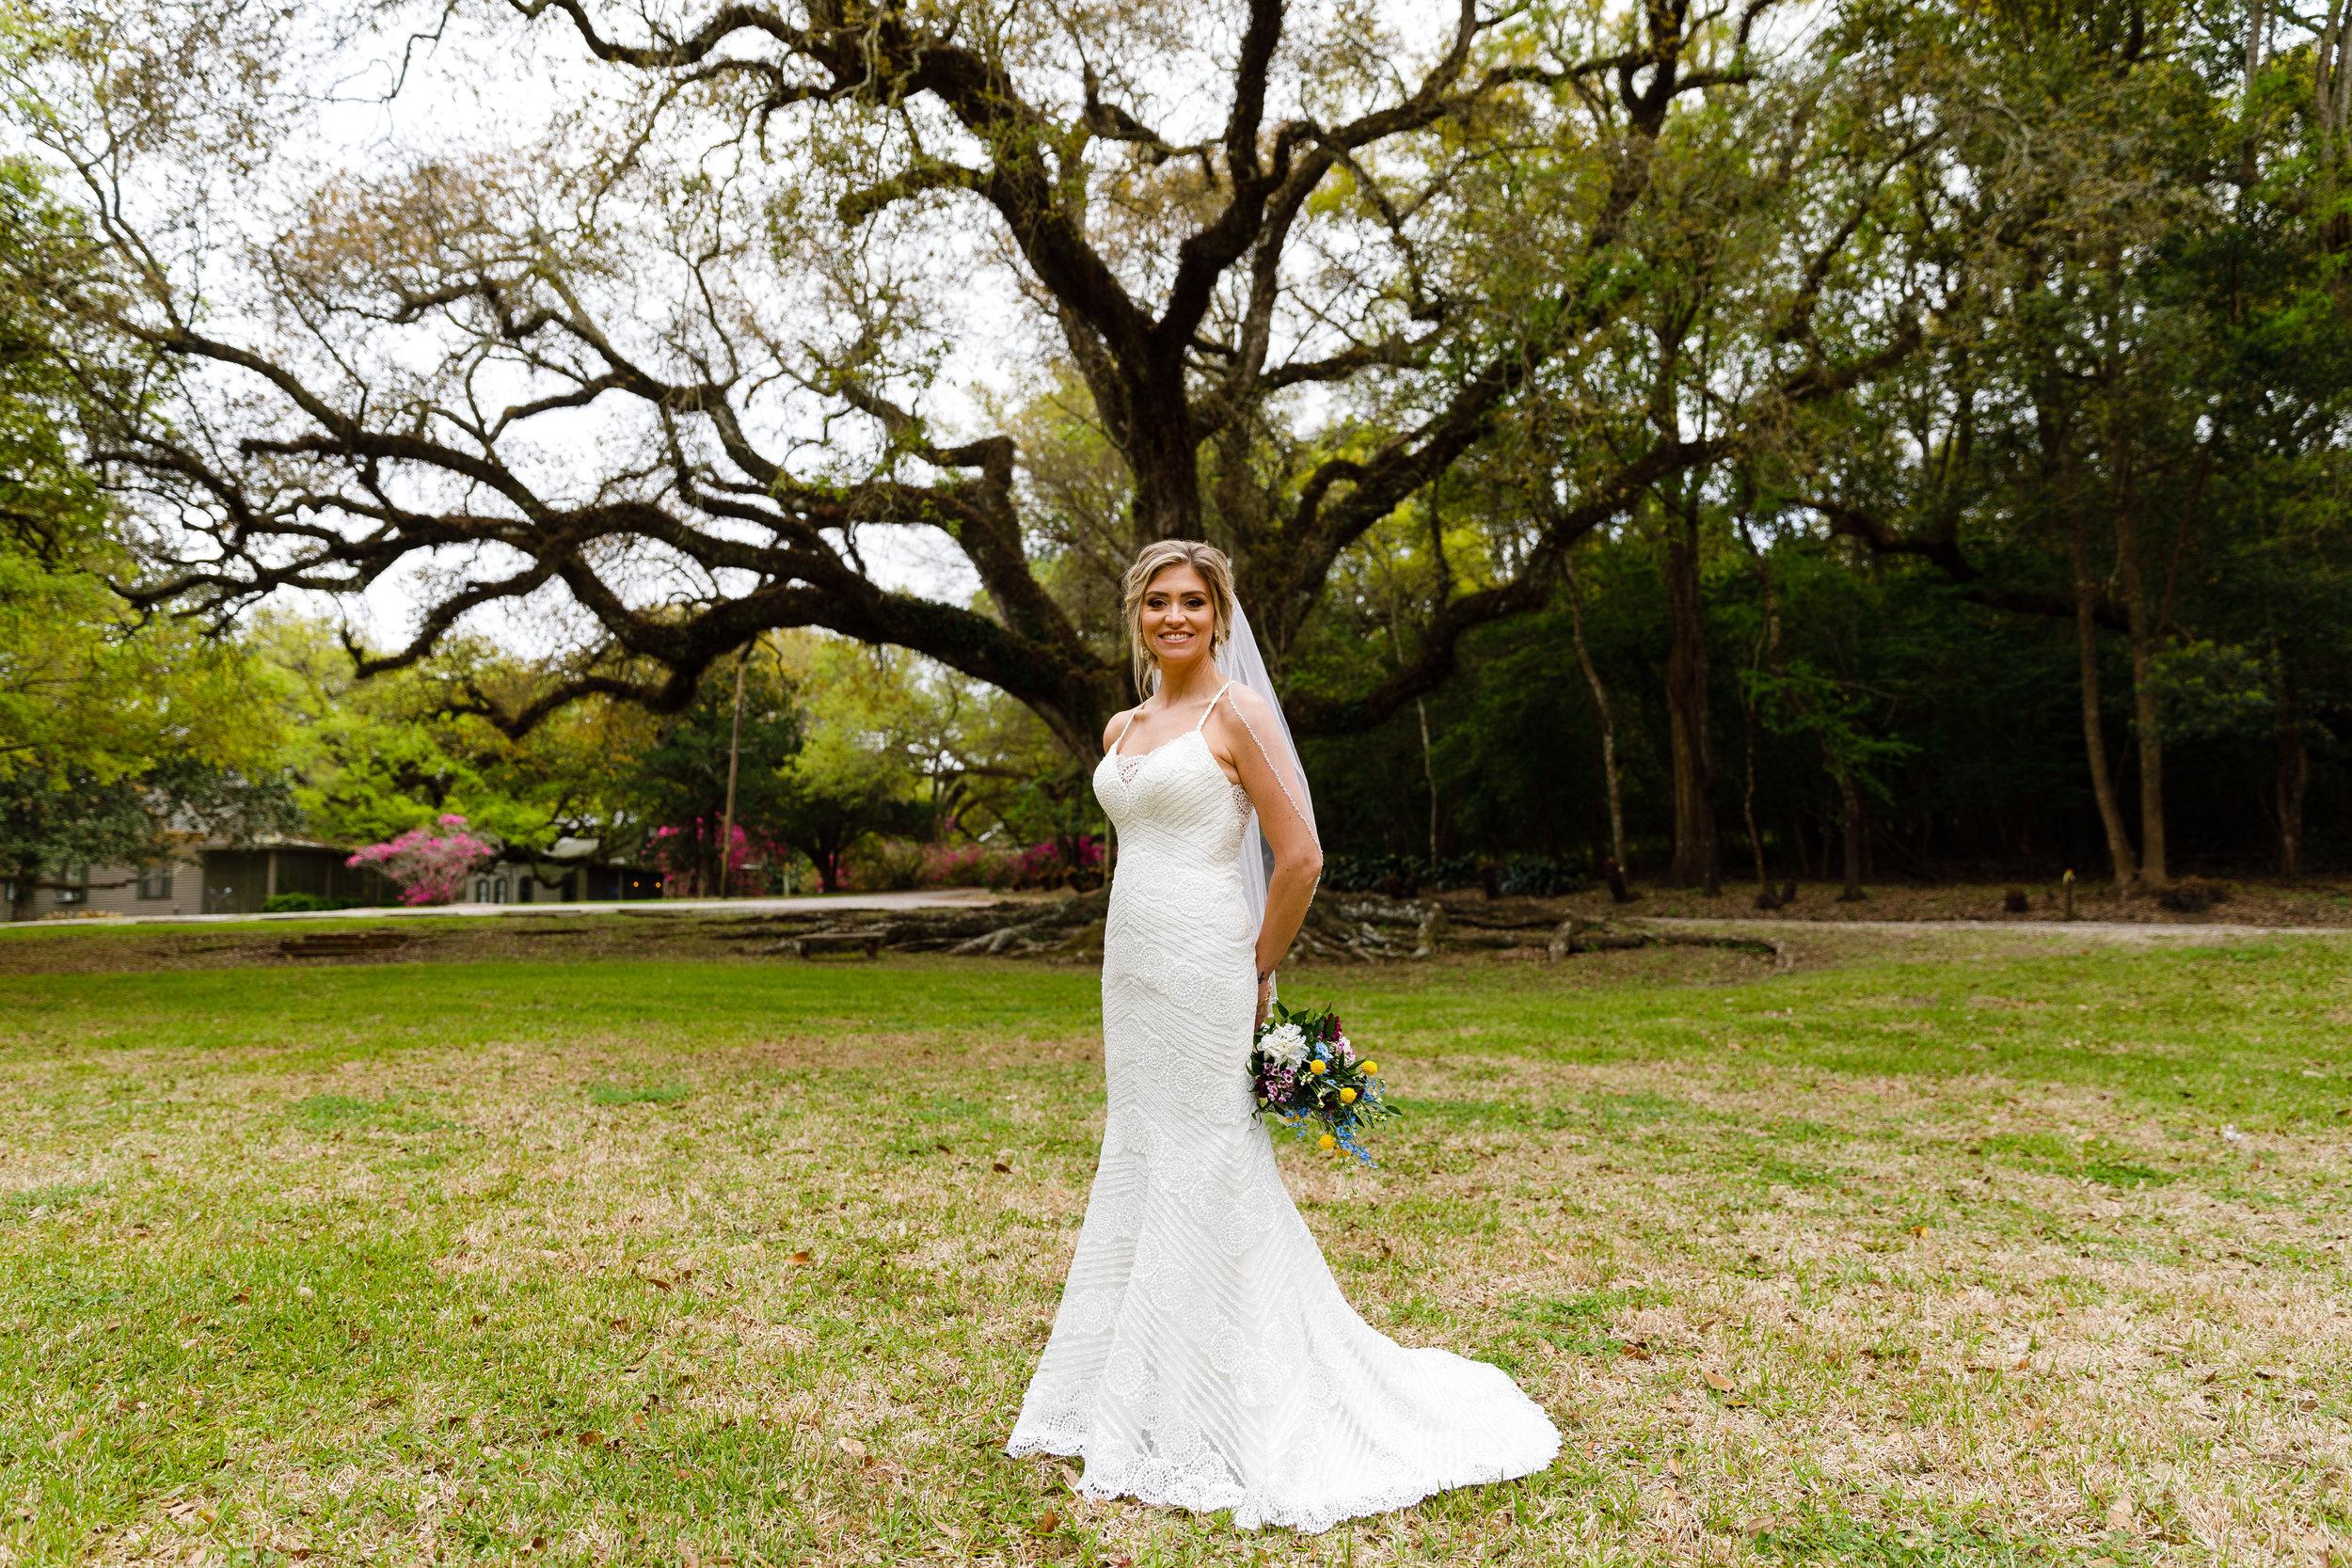 Youngsville-lafayette-portrait-family-wedding-photographer-2999.jpg